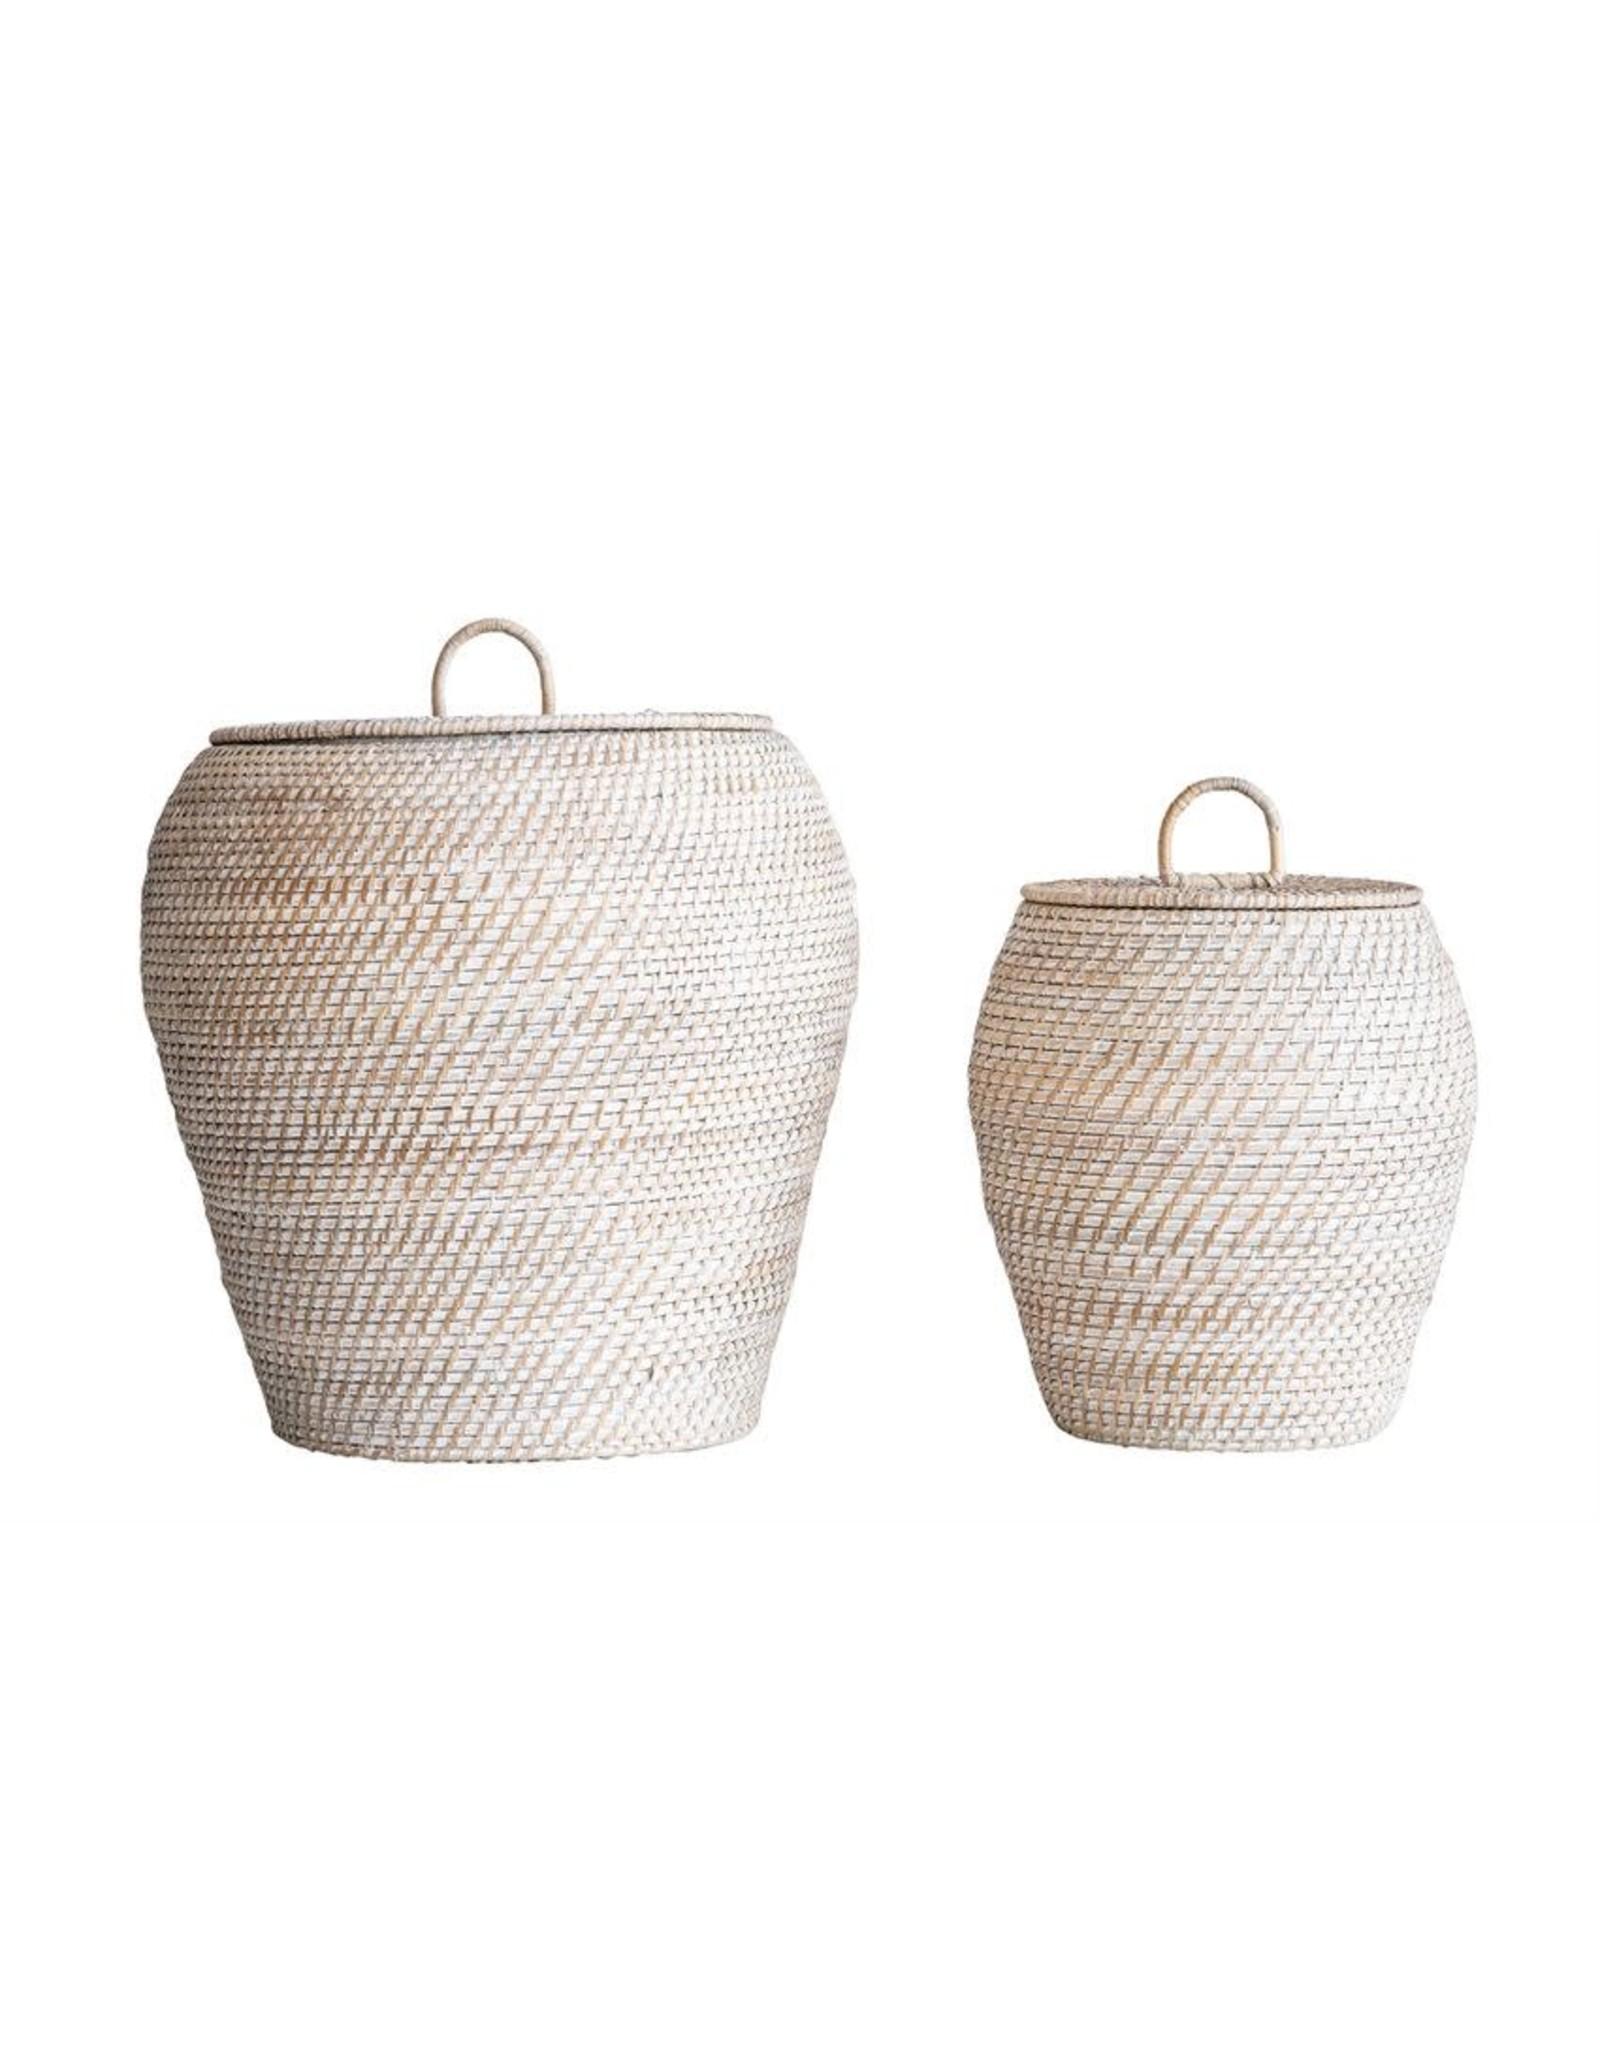 Website Whitewashed Rattan Basket Set with Lids